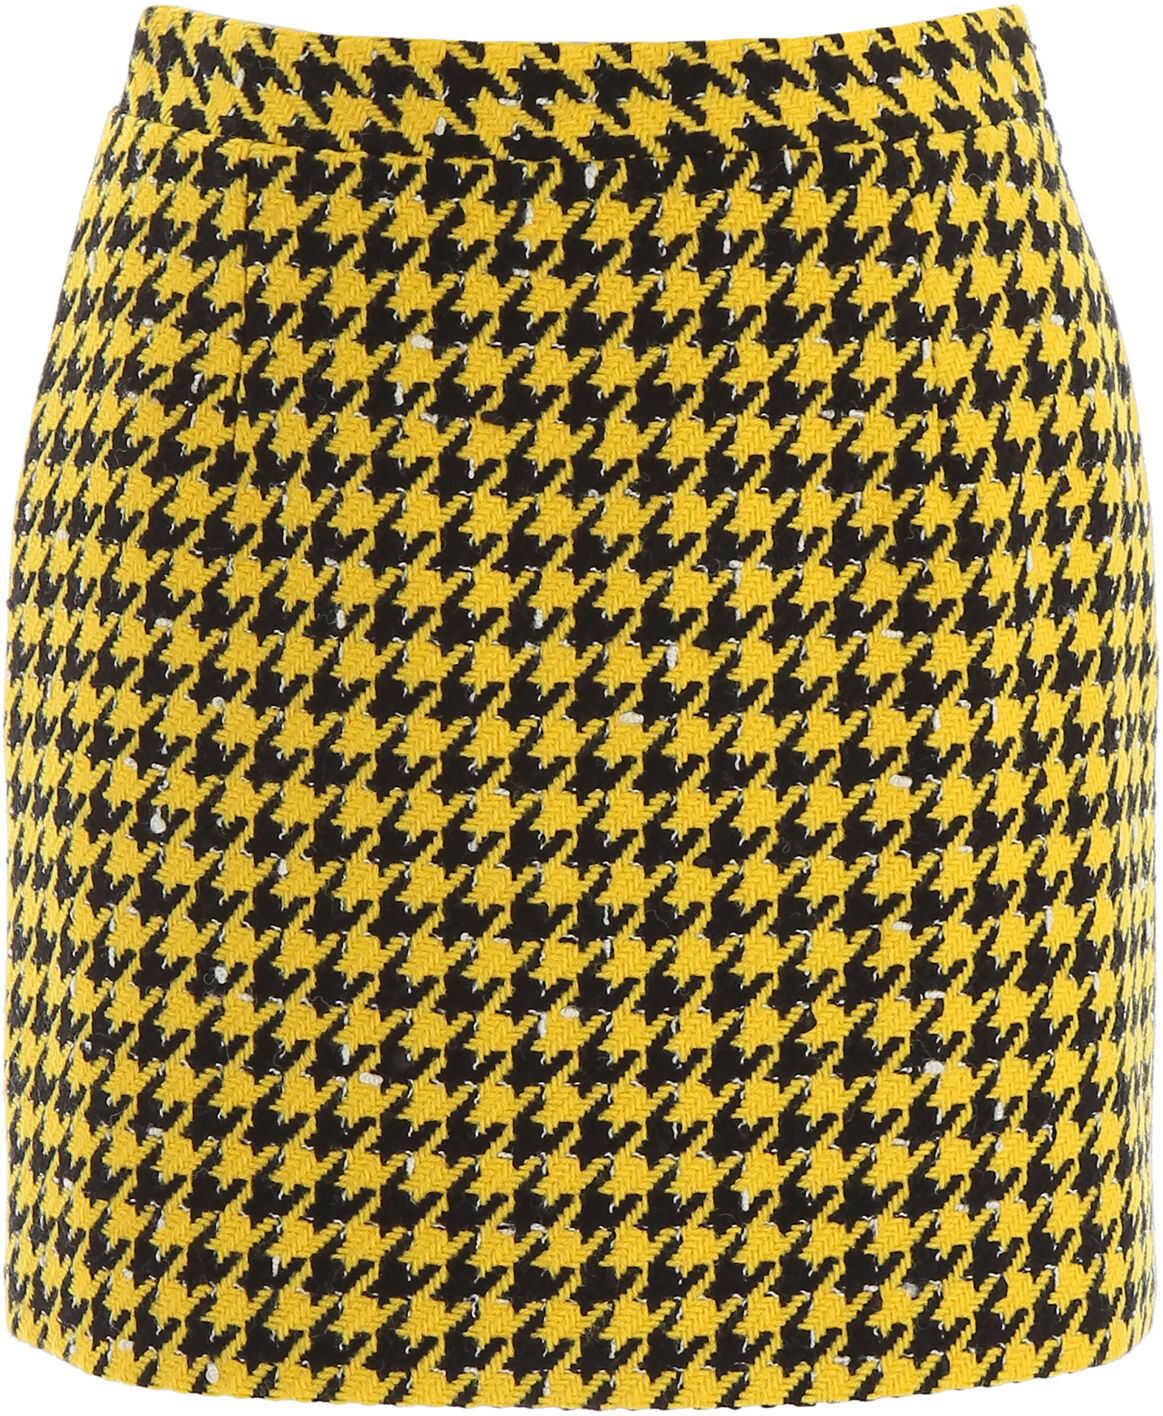 Alessandra Rich Houndstooth Mini Skirt YELLOW BLACK